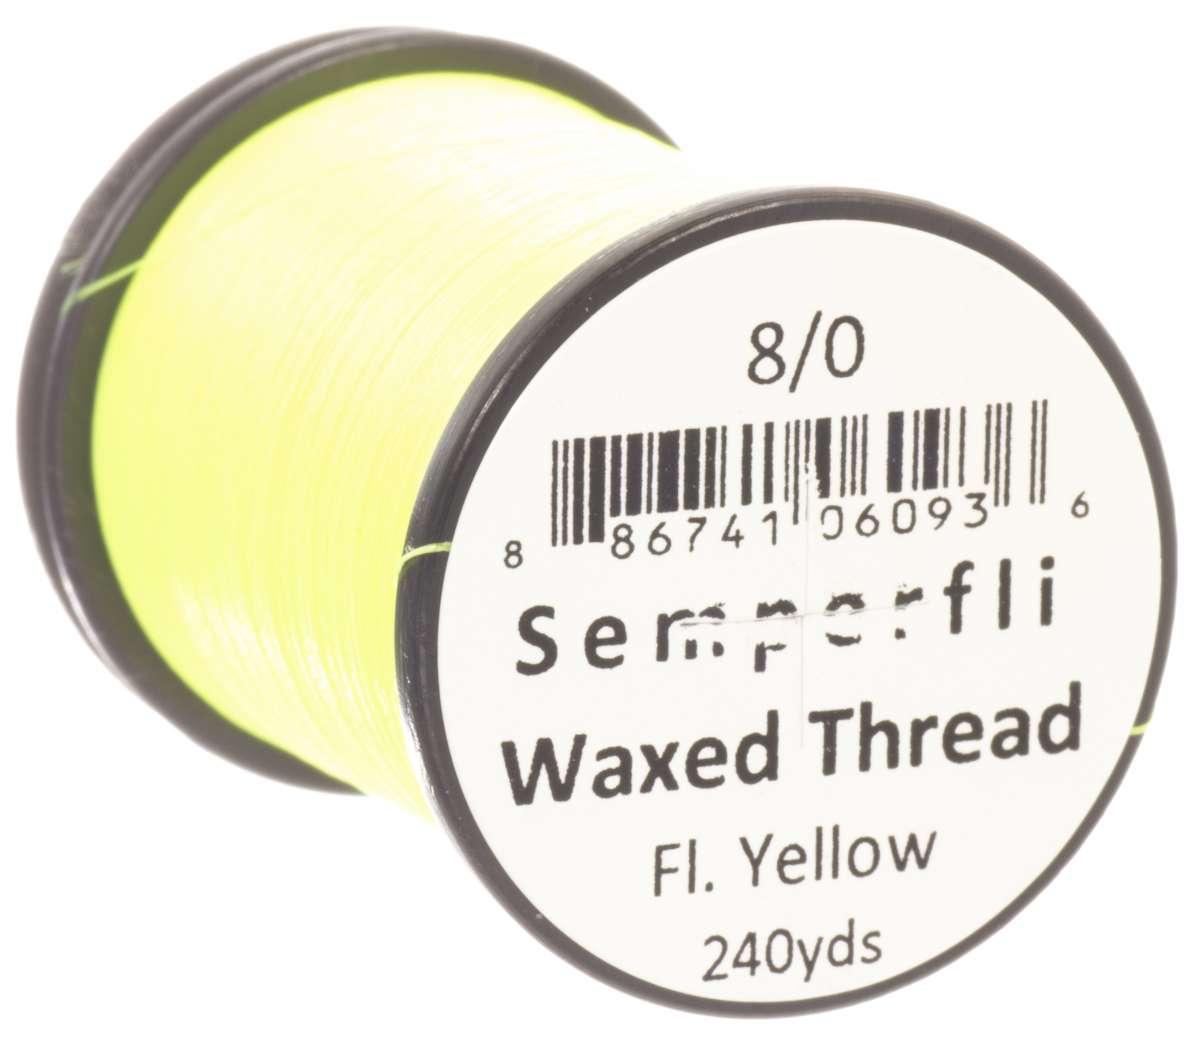 8/0 Classic Waxed Fluoro Yellow Sem-0400-1835